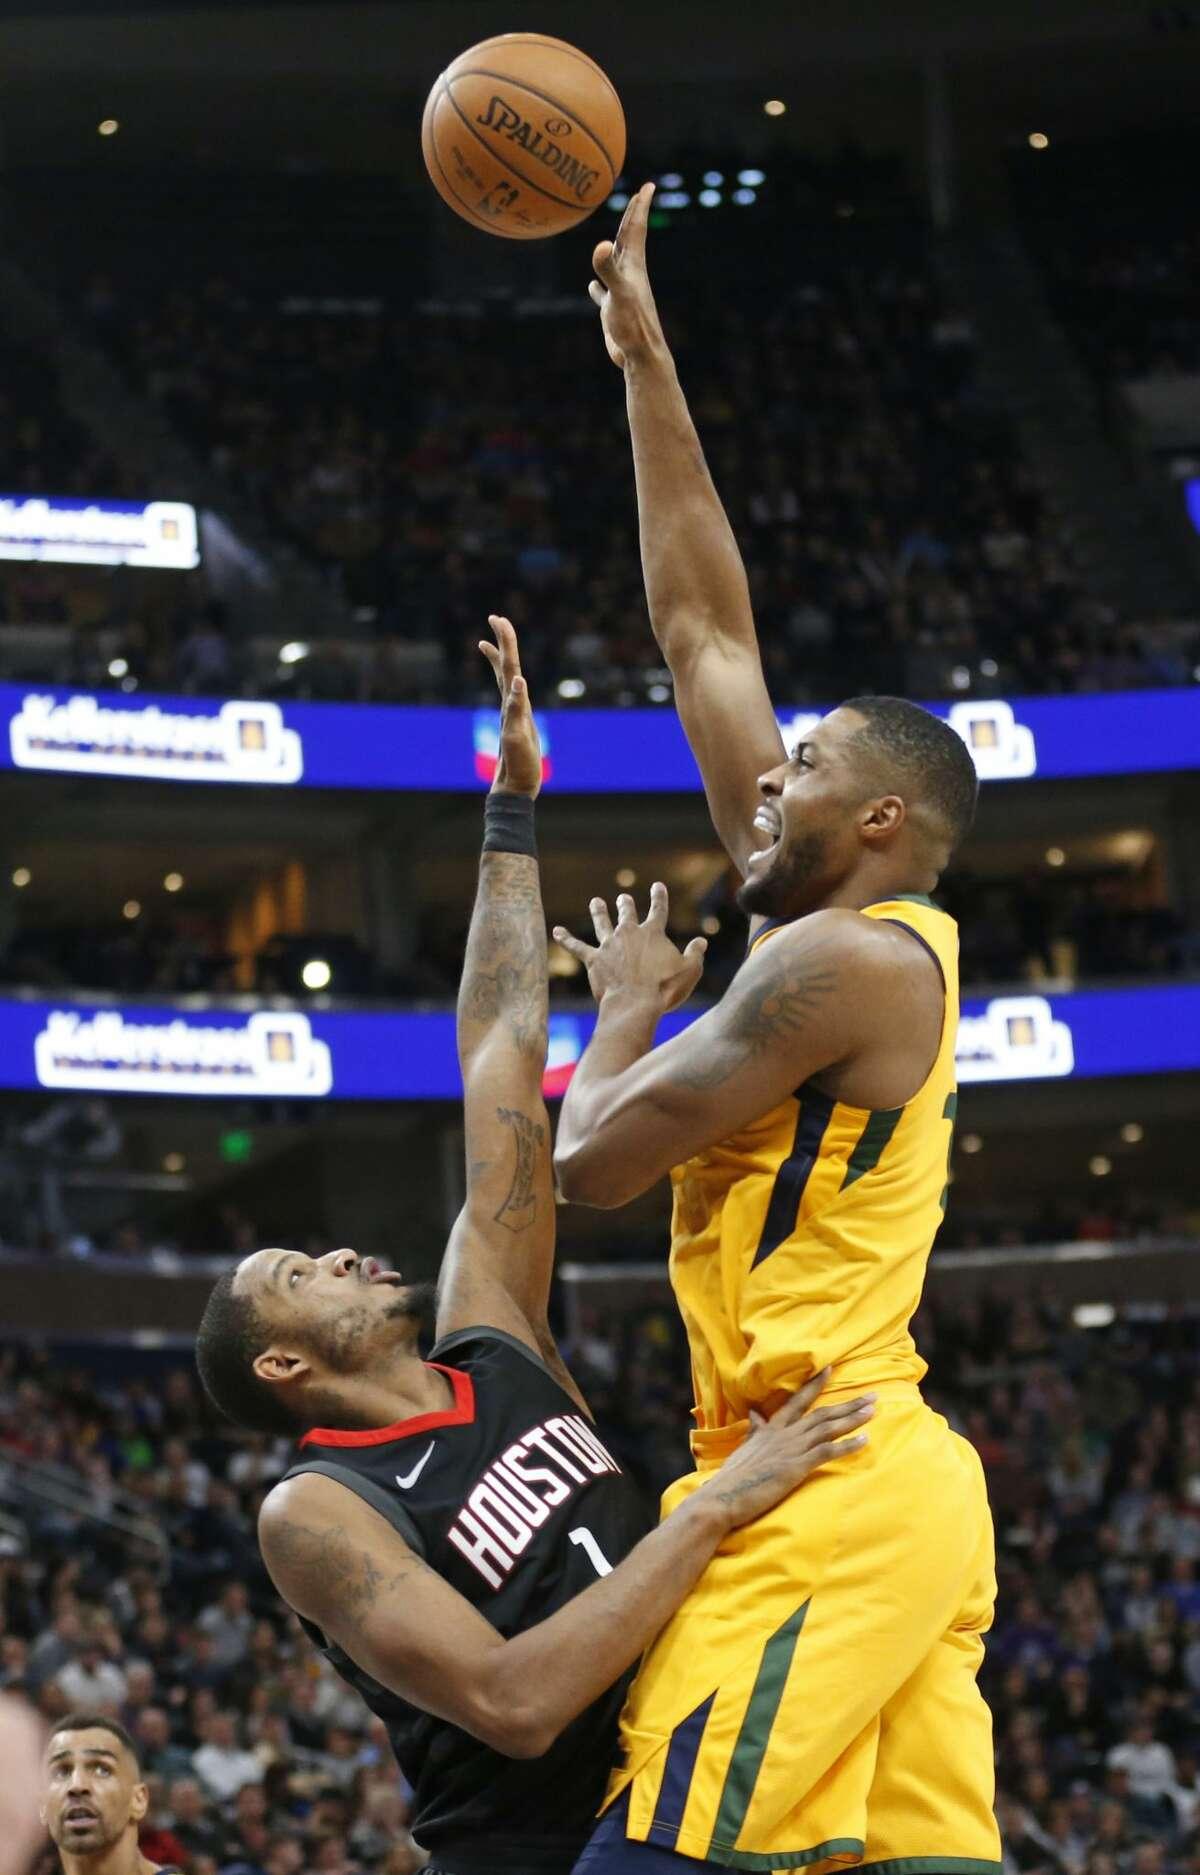 Utah Jazz forward Derrick Favors, right, shoots as Houston Rockets forward Trevor Ariza (1) defends during the second half of an NBA basketball game Thursday, Dec. 7, 2017, in Salt Lake City. (AP Photo/Rick Bowmer)